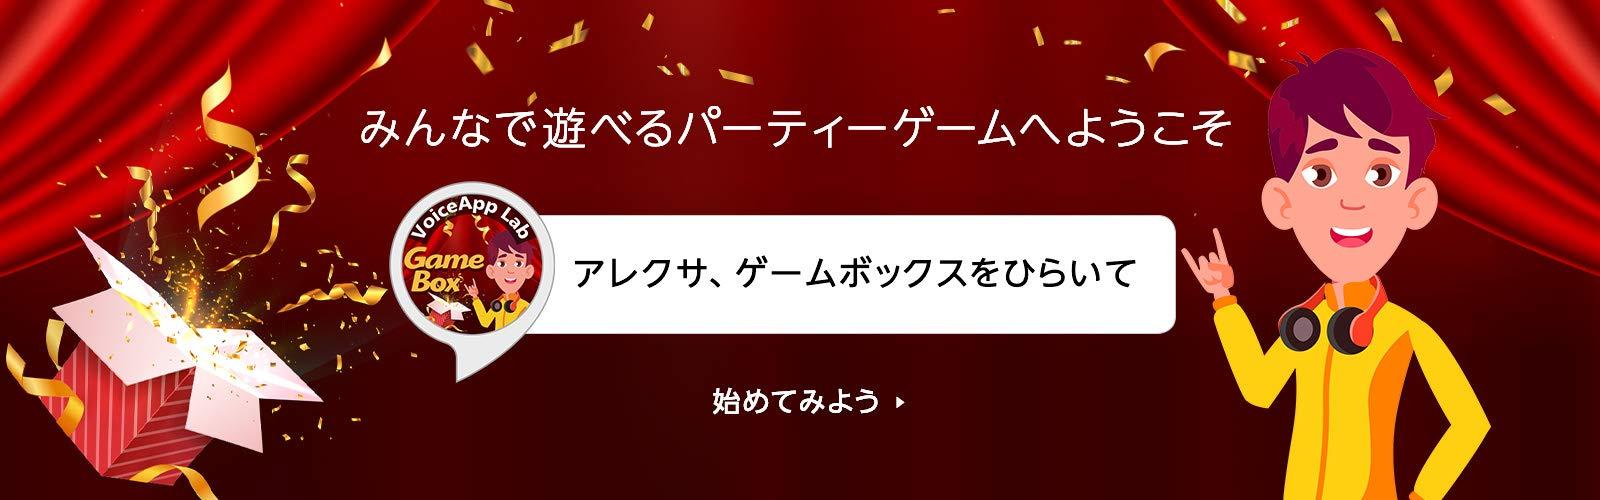 amazon 電話 番号 日本